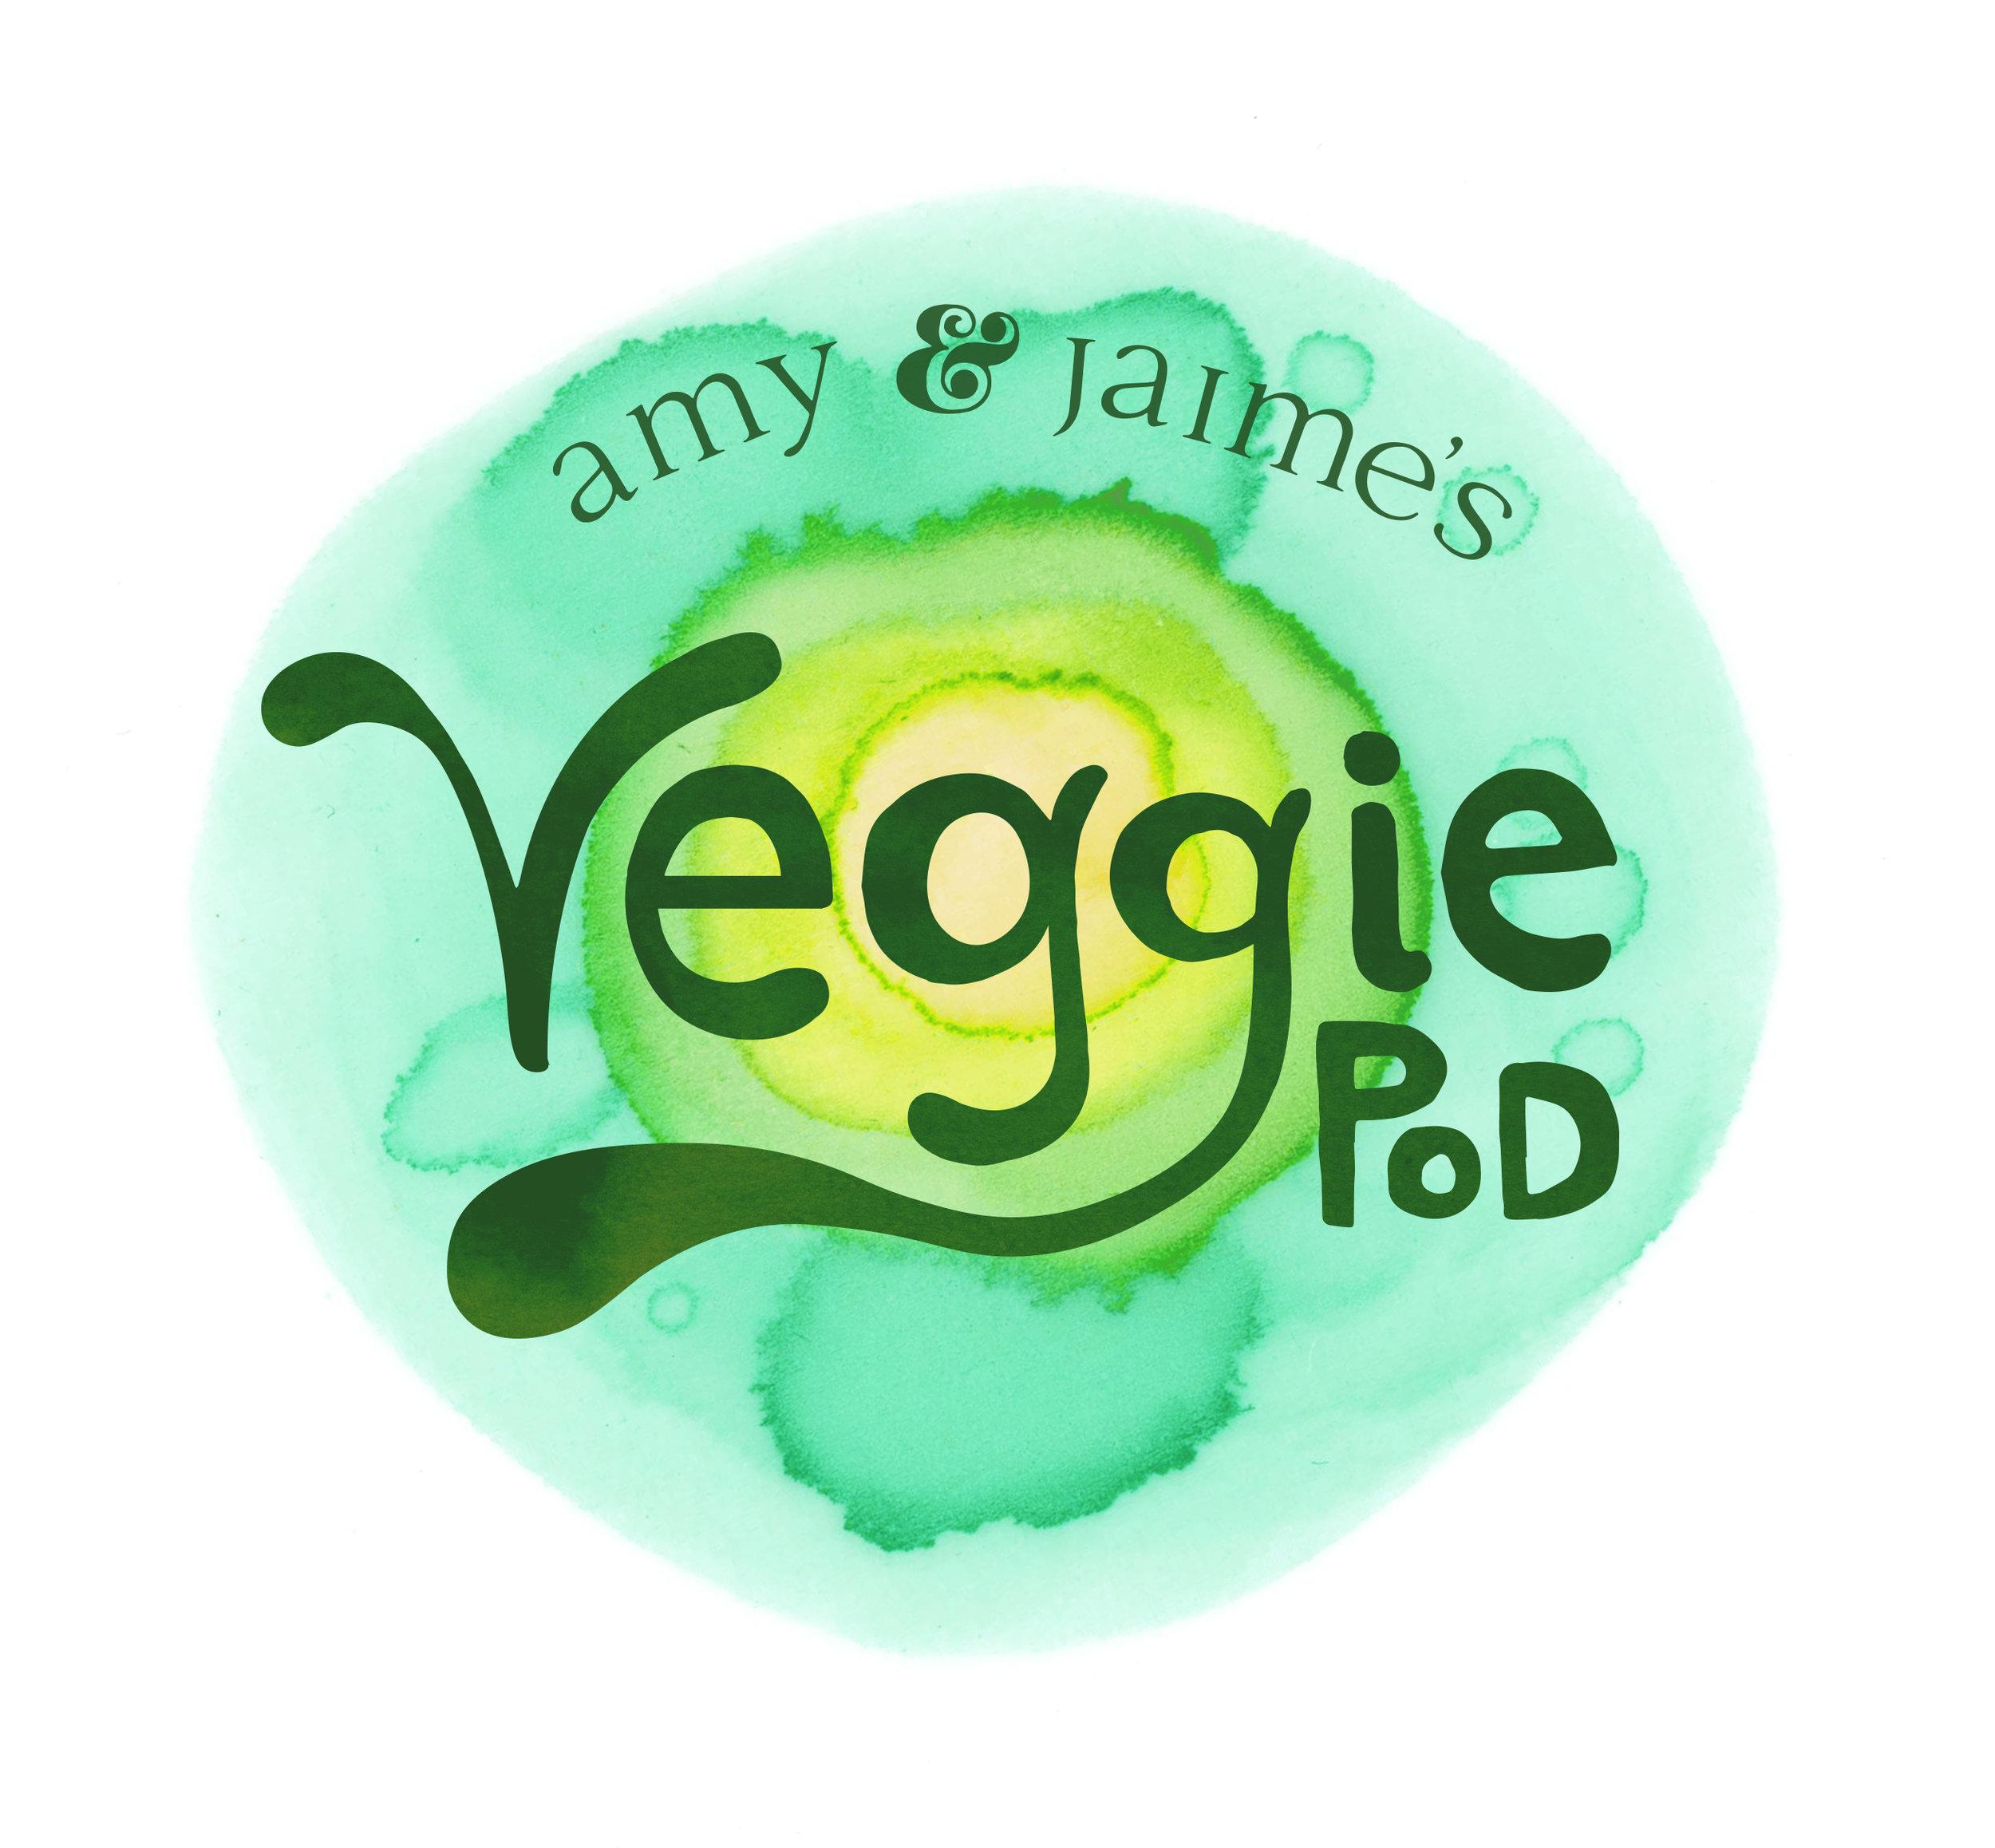 Veggie Pod logo.jpg